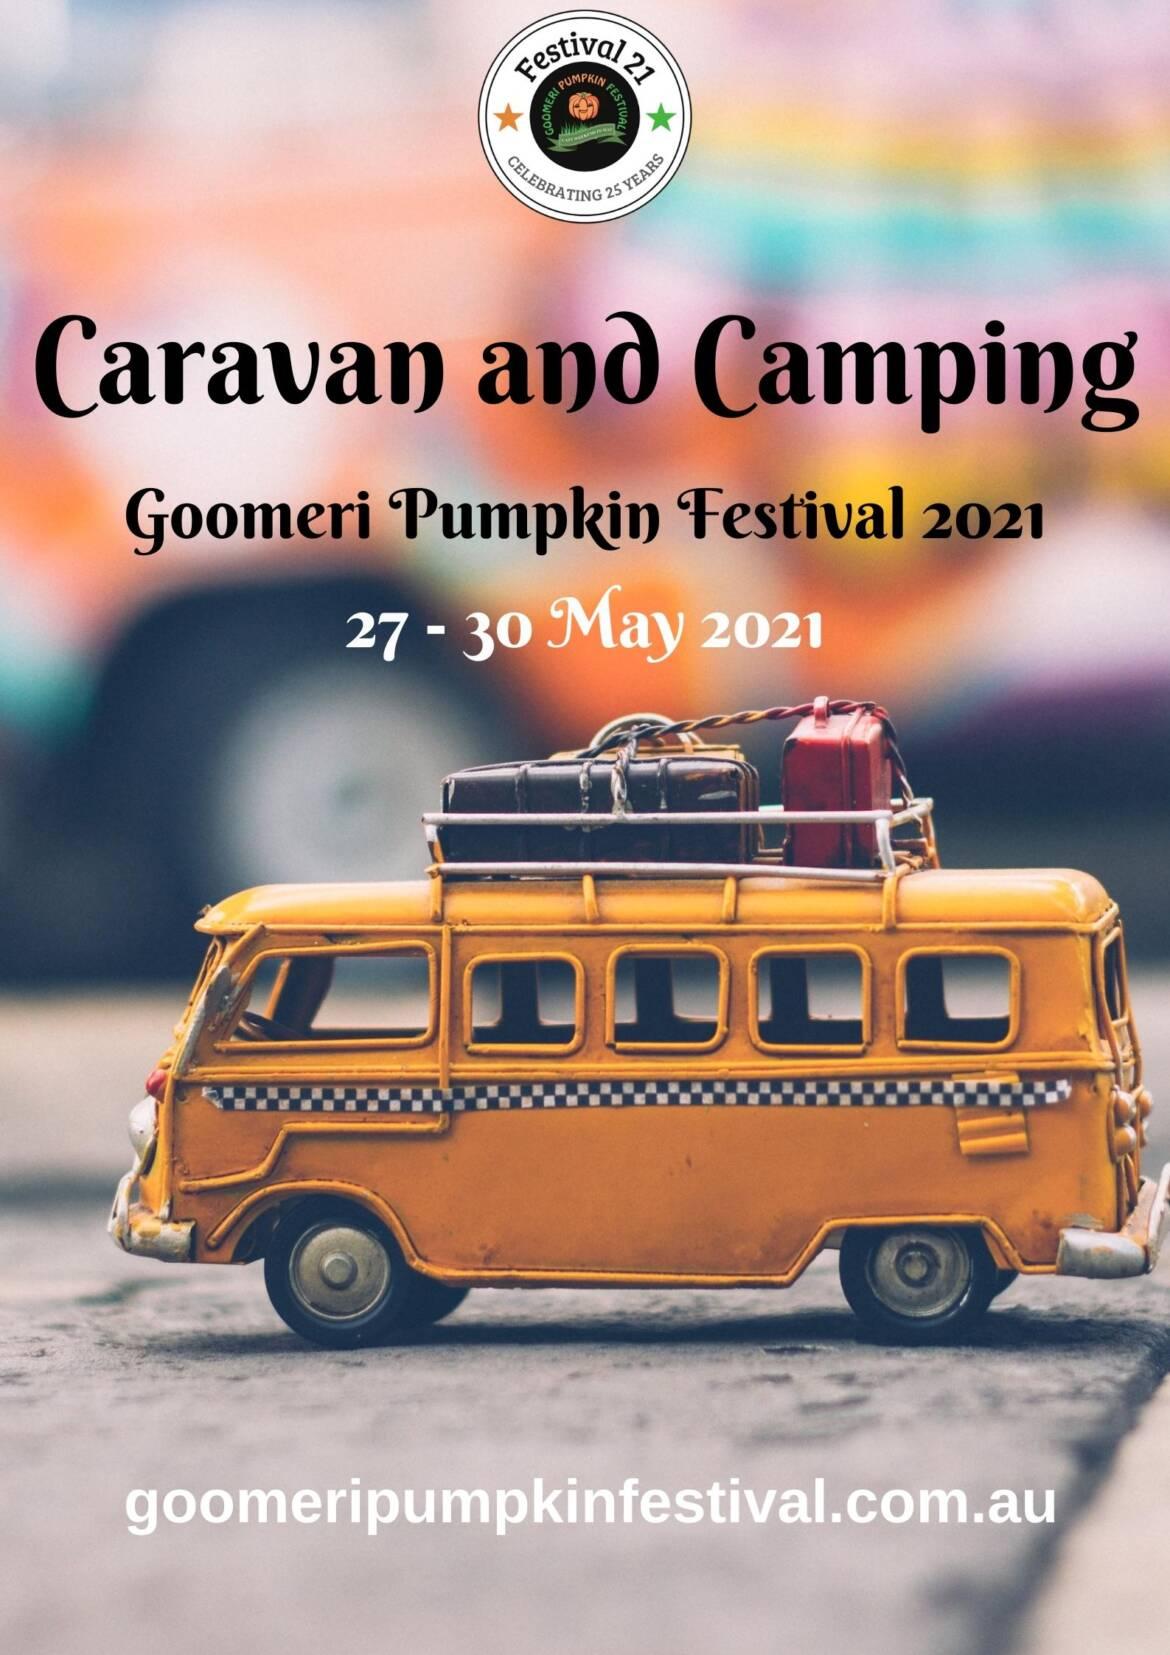 Caravanning-and-Camping.jpg